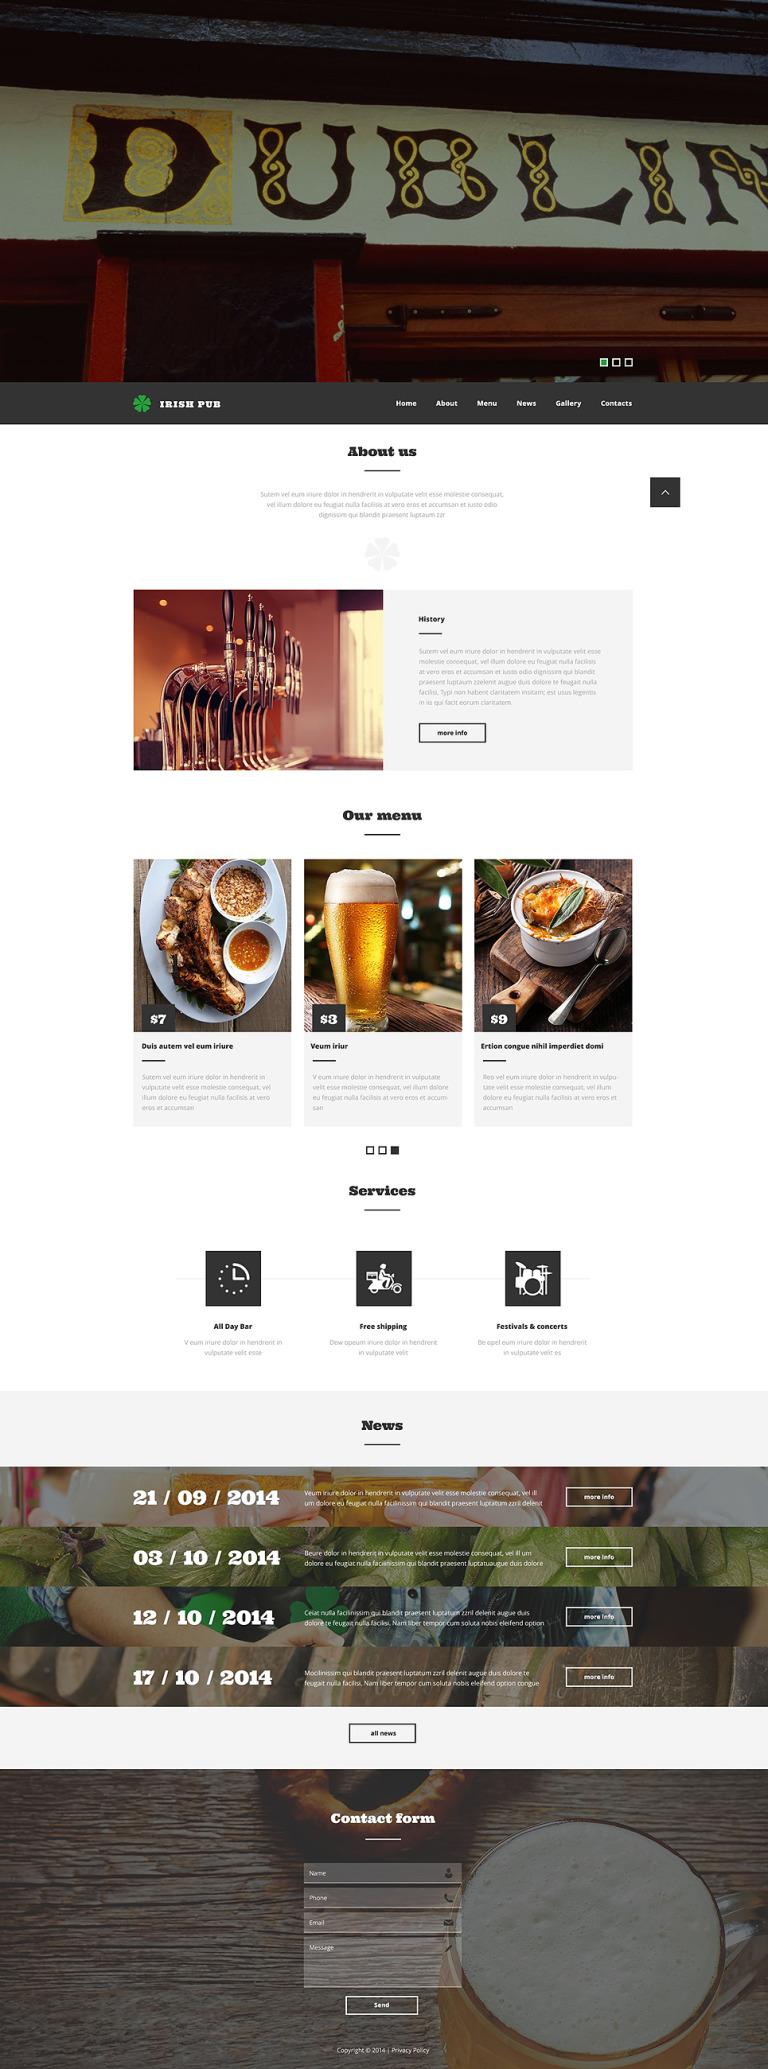 Irish Pub Website Template New Screenshots BIG